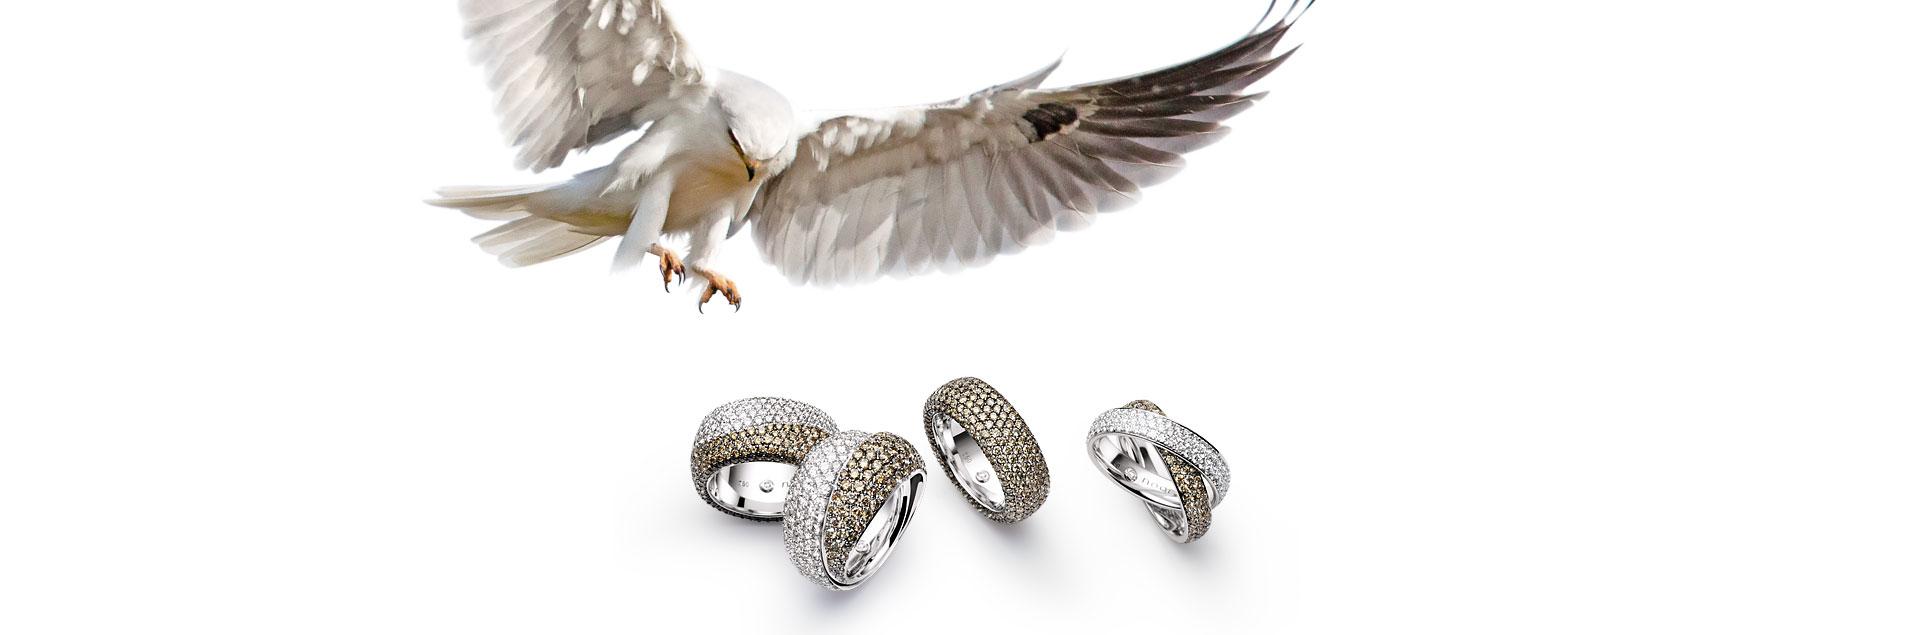 noor-by-wurster-diamonds_white-tale-kite